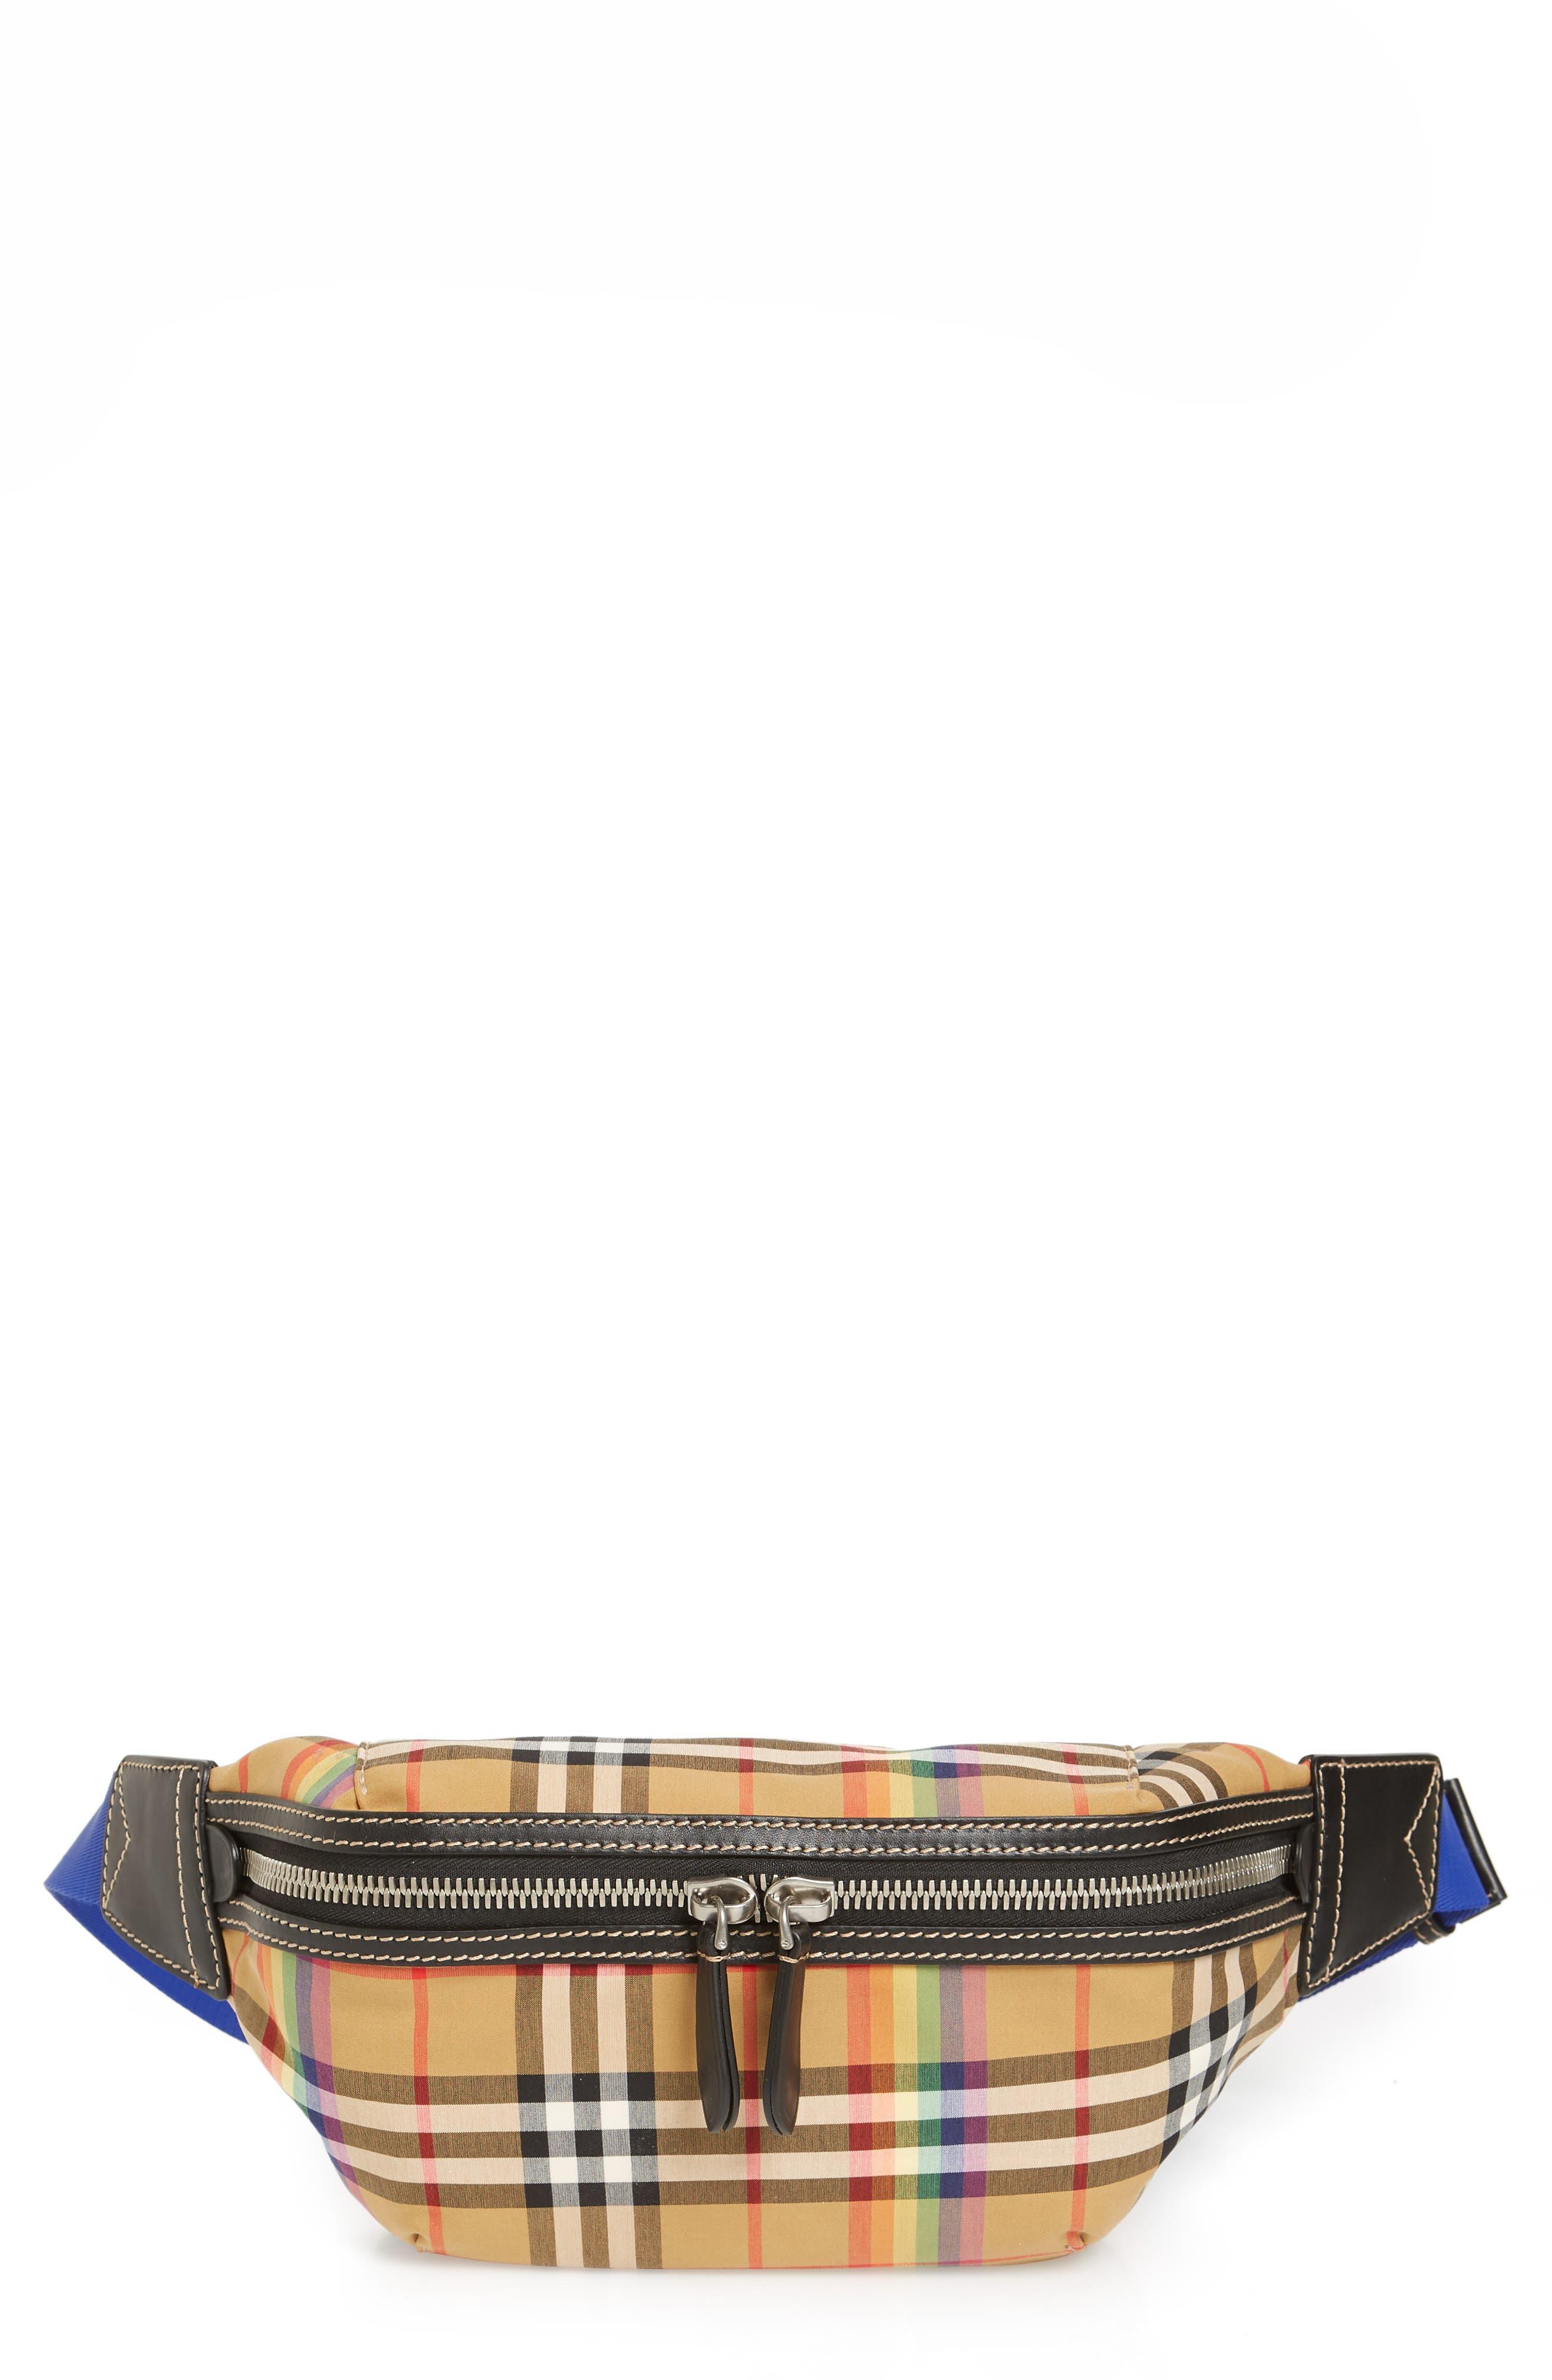 Medium Sonny Vintage Check Bum Bag,                         Main,                         color, 250